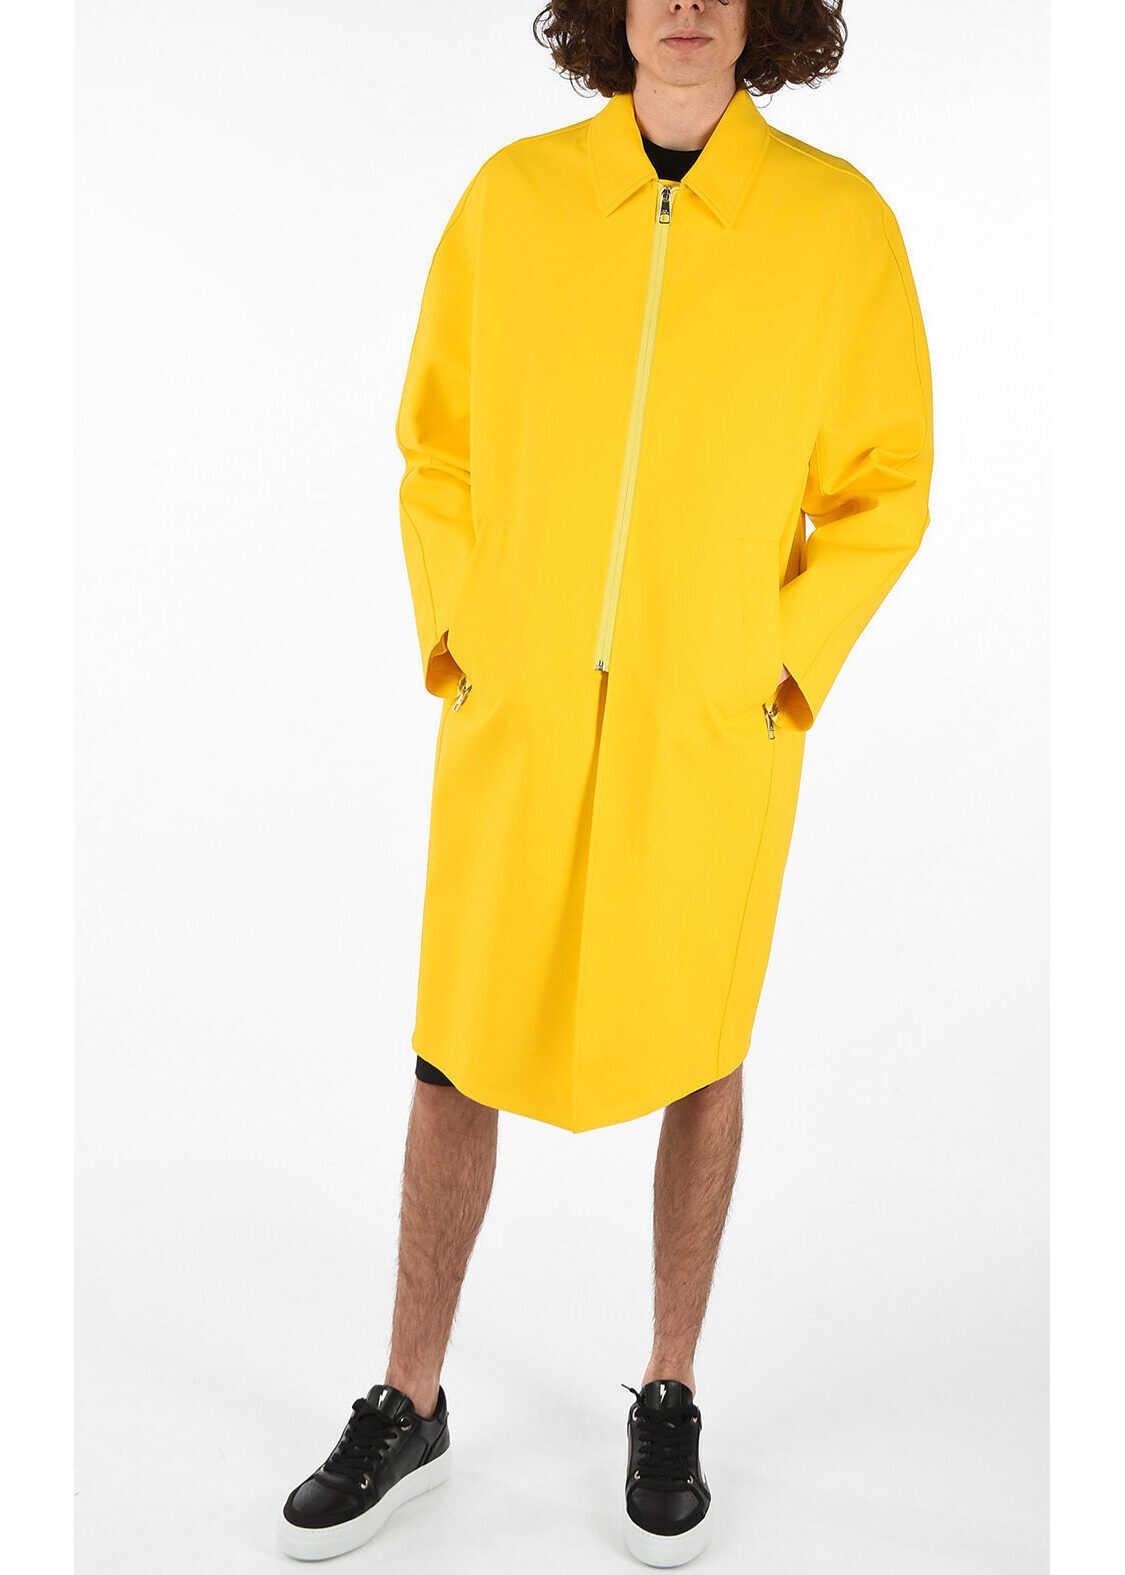 Neil Barrett Waterproof Raincoat YELLOW